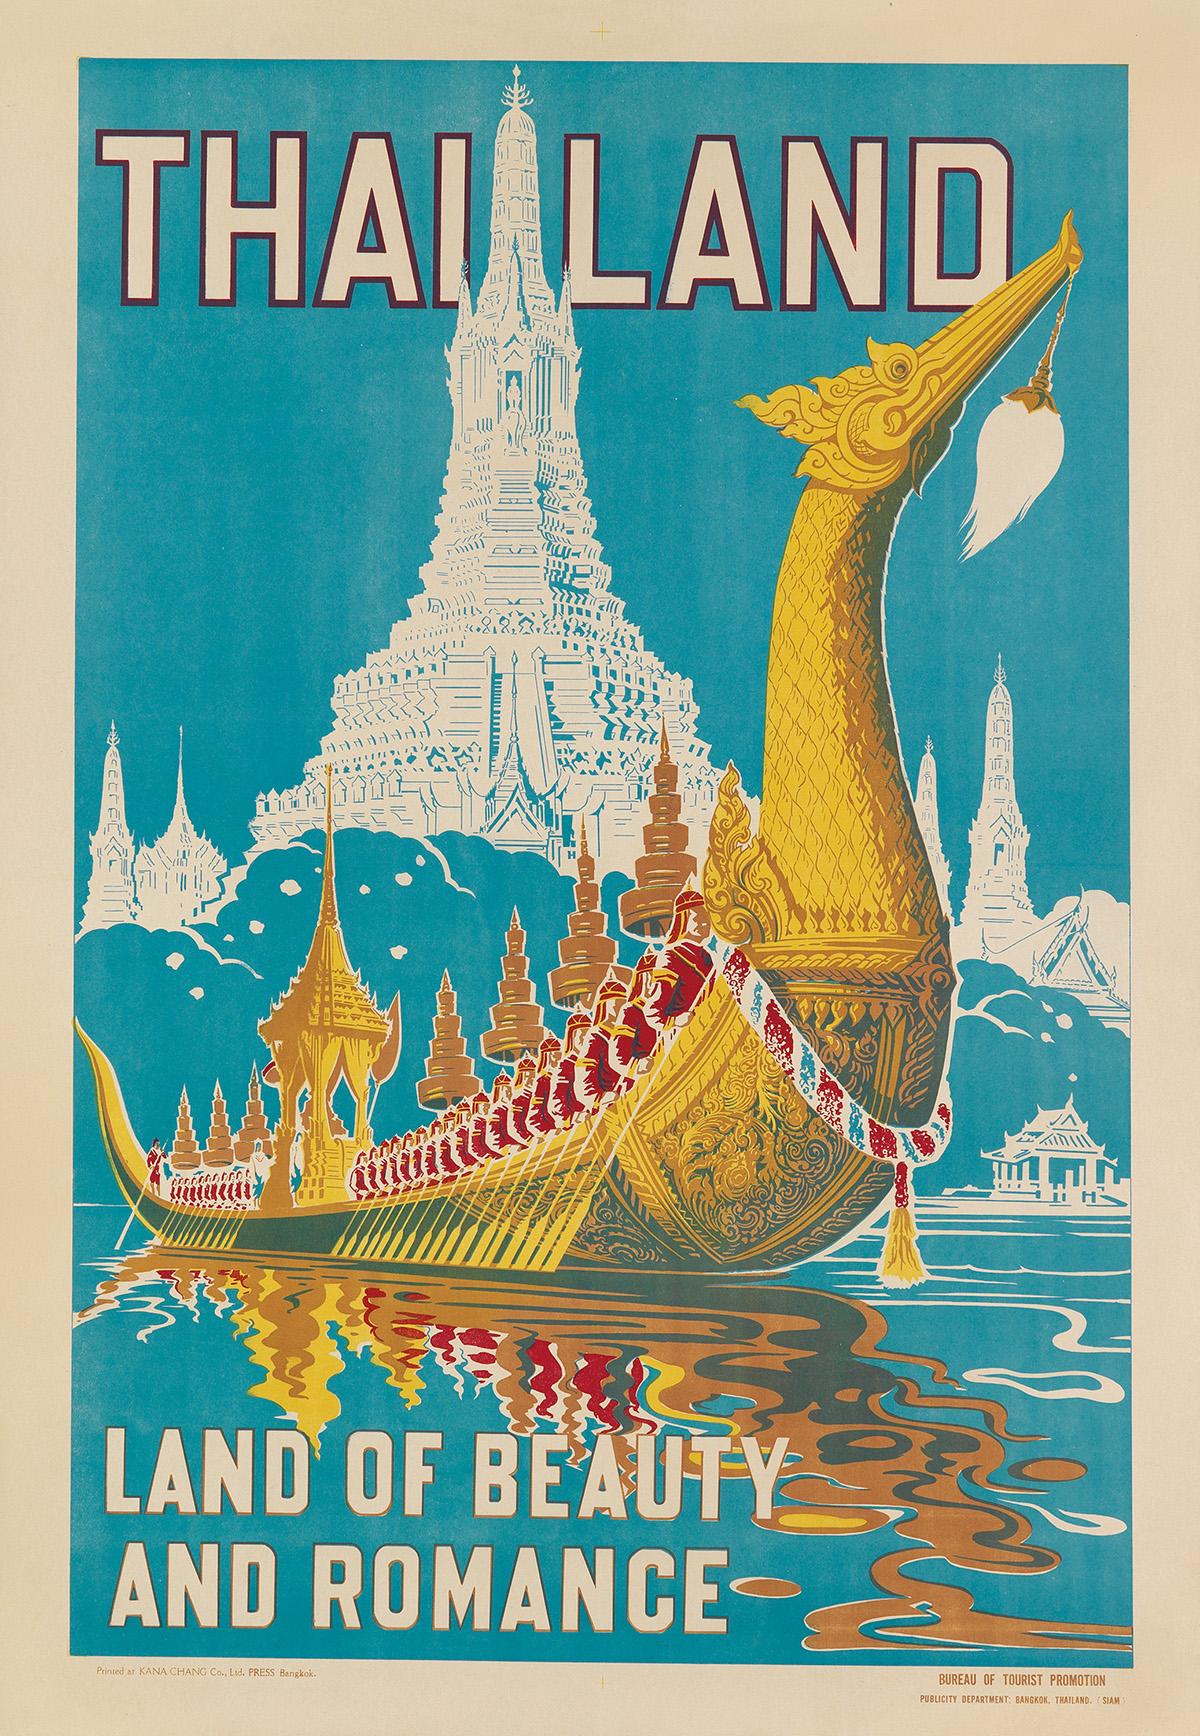 DESIGNER-UNKNOWN-THAILAND--LAND-OF-BEAUTY-AND-ROMANCE-Circa-1950s-31x21-inches-78x55-cm-Kana-Chang-Co-Ltd-Bangkok